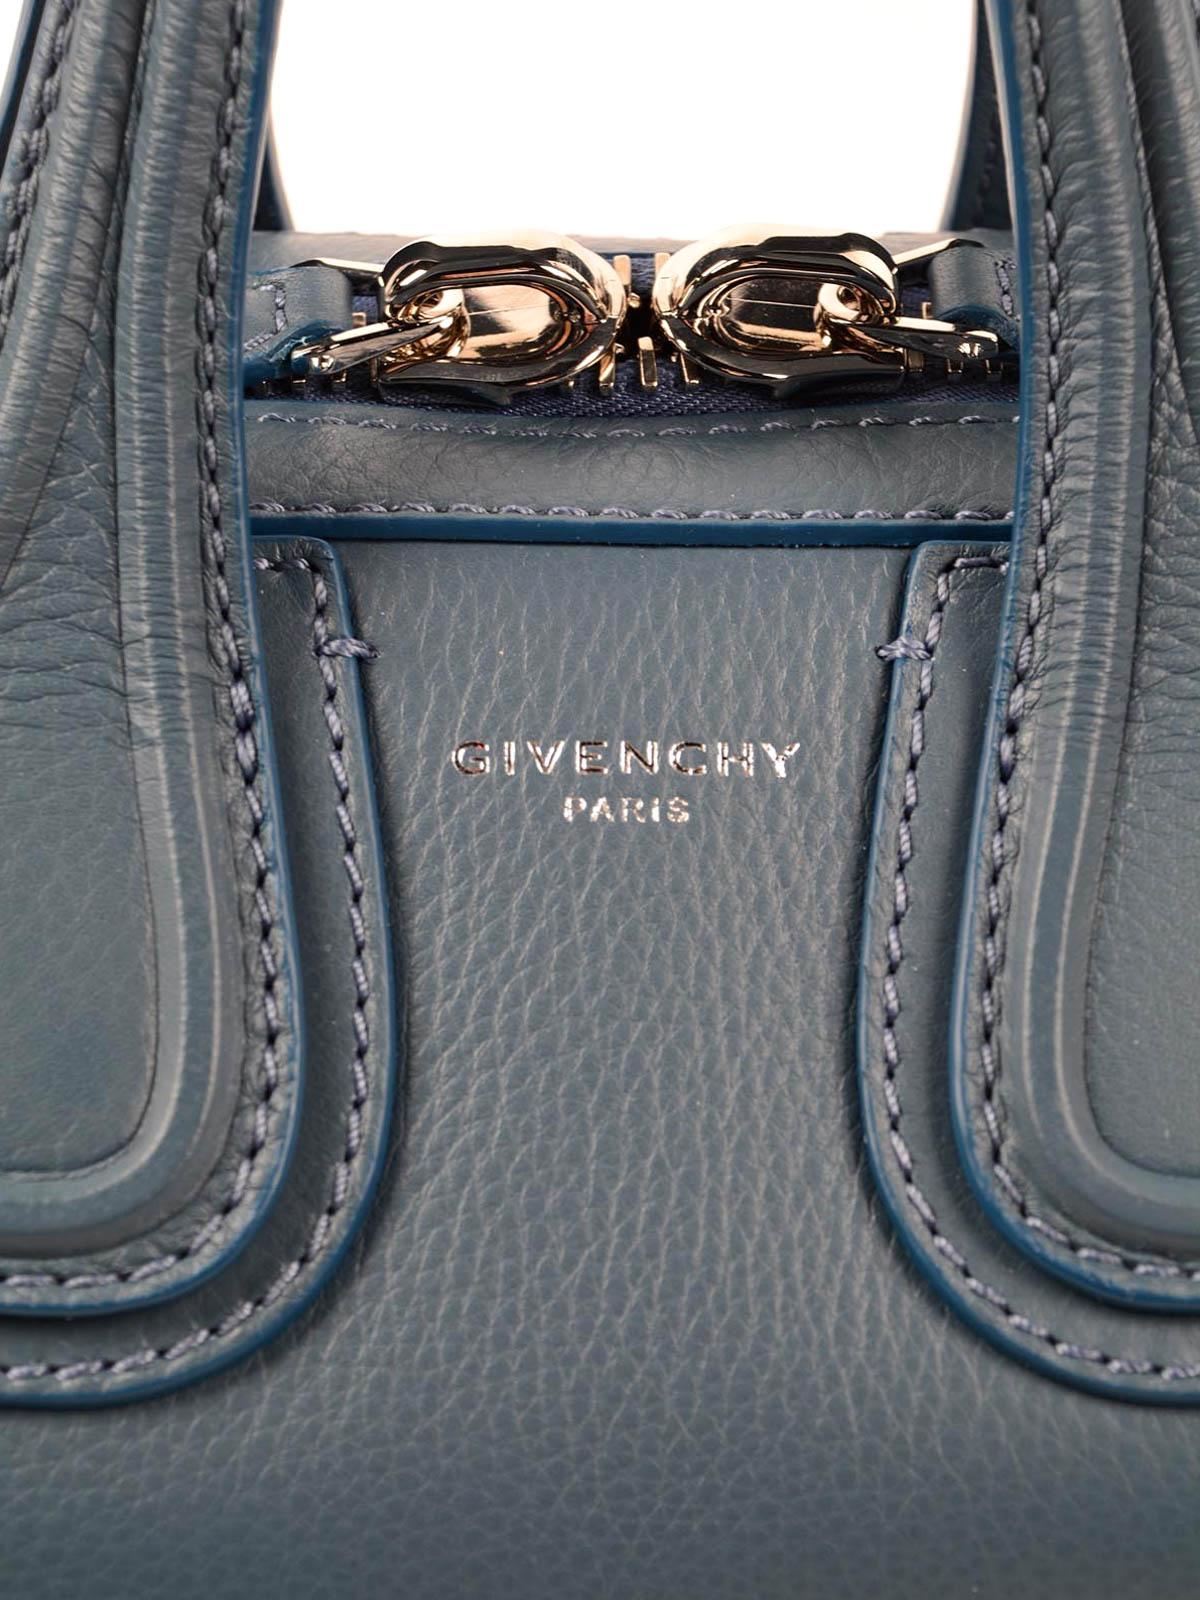 1dc15b2d5e1 ... bowling bags - Small Nightingale bag · Small Nightingale bag shop online   GIVENCHY